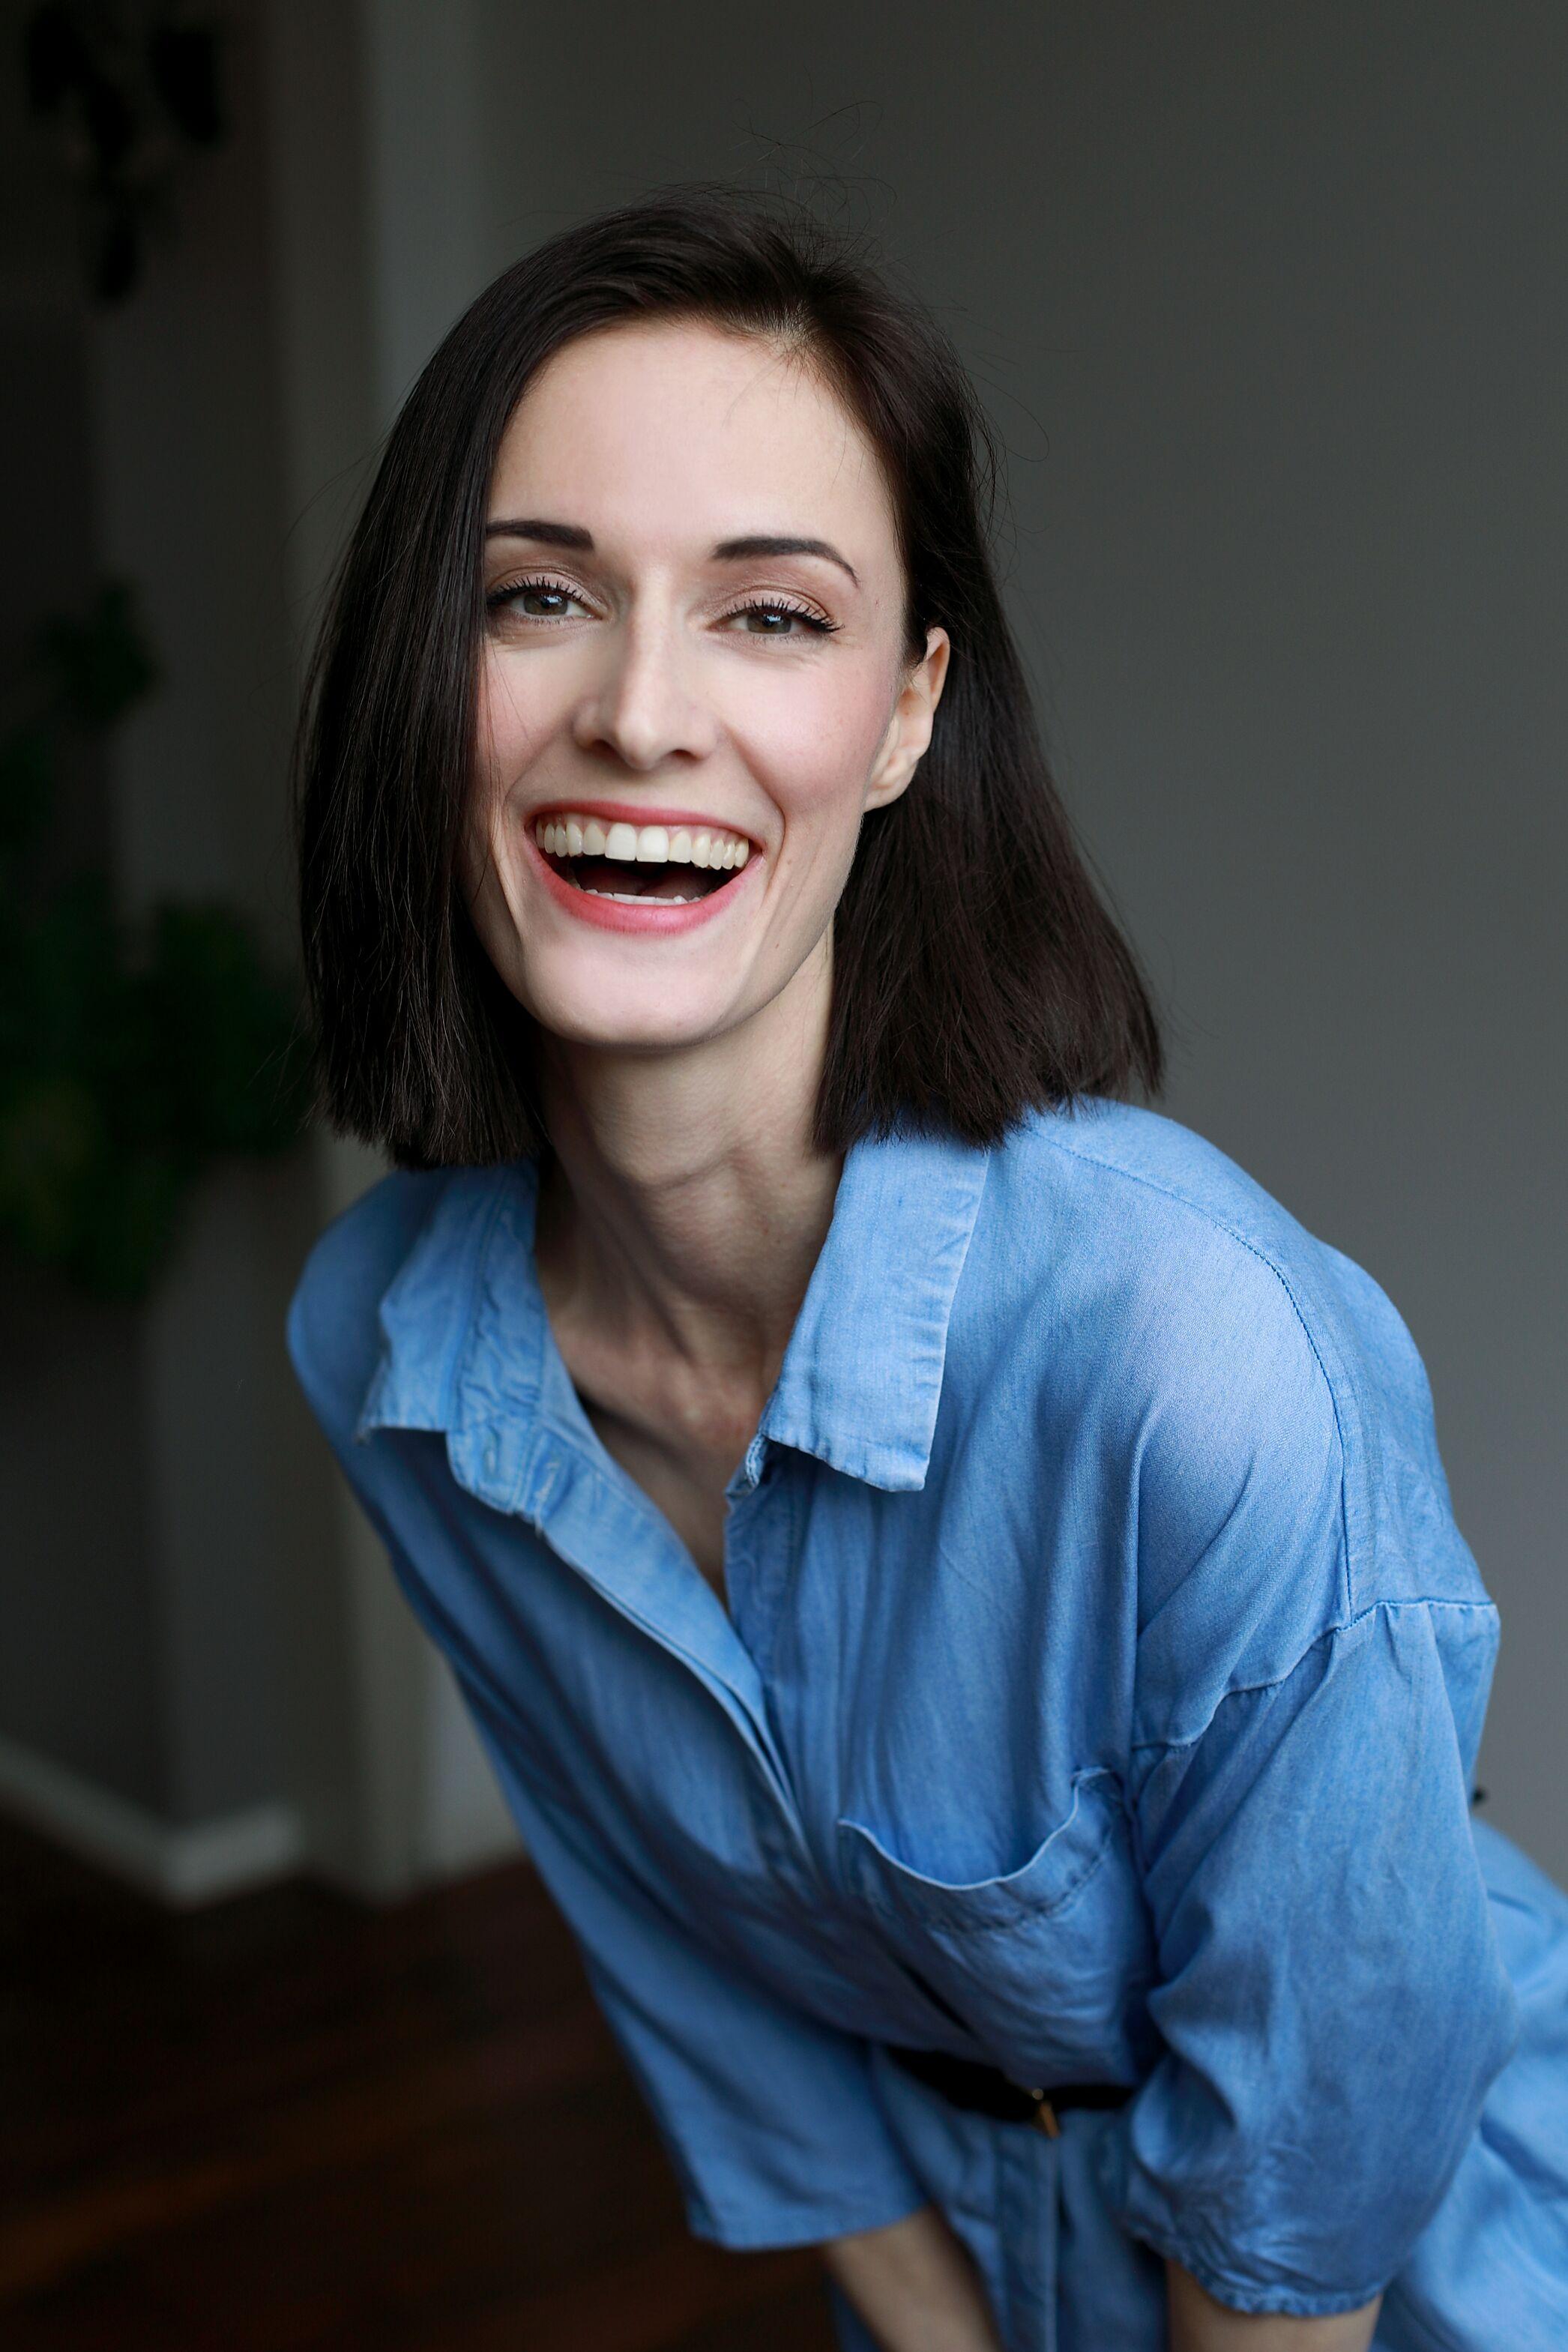 Castupload - worldwide online casting